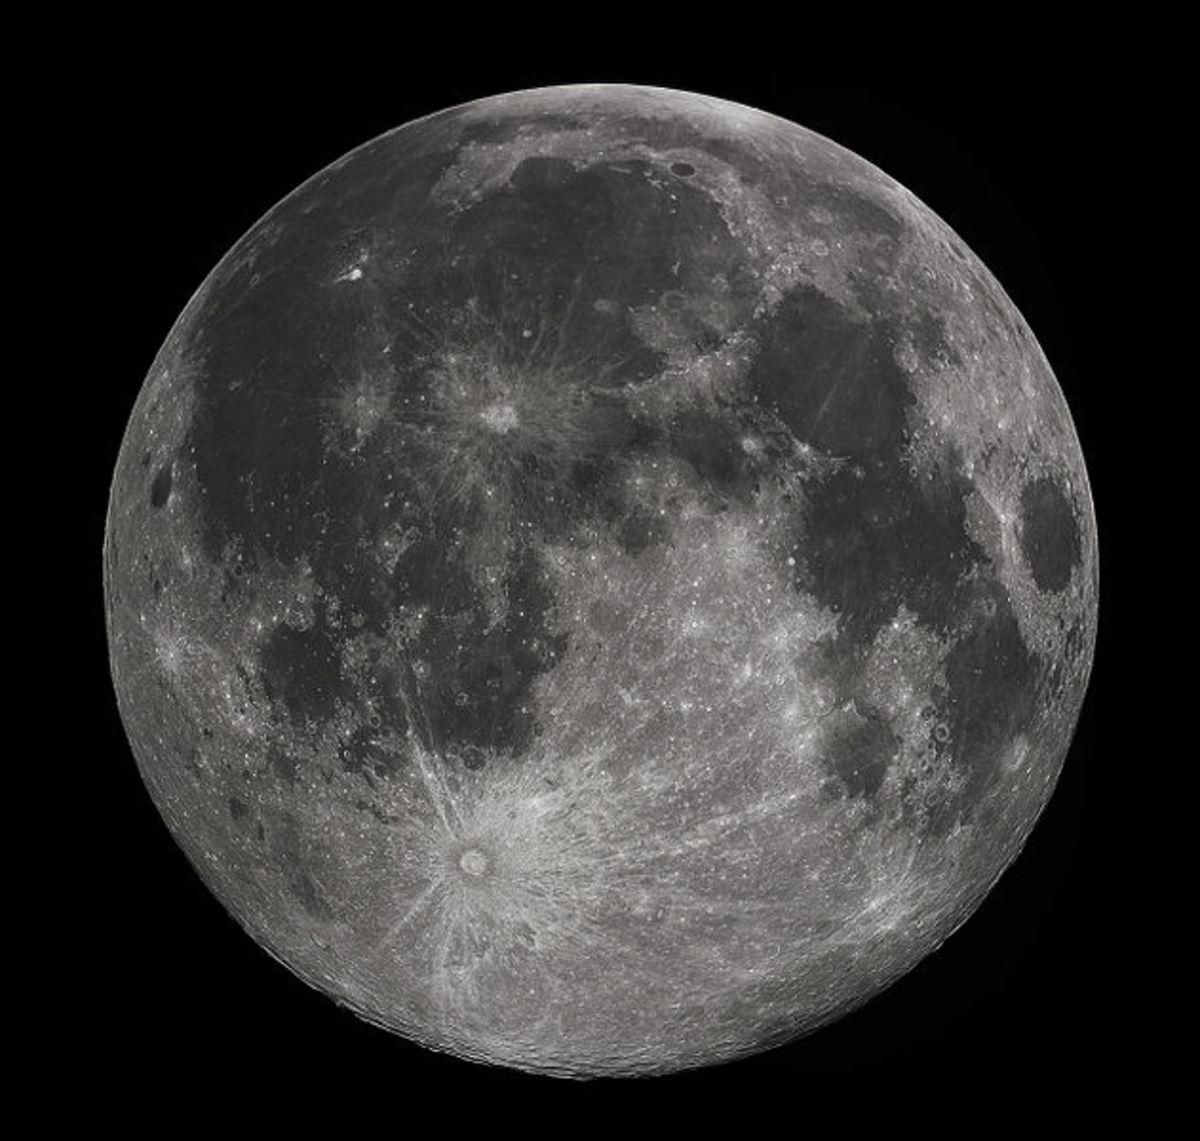 planets-in-scorpio-part-2-mars-venus-and-moon